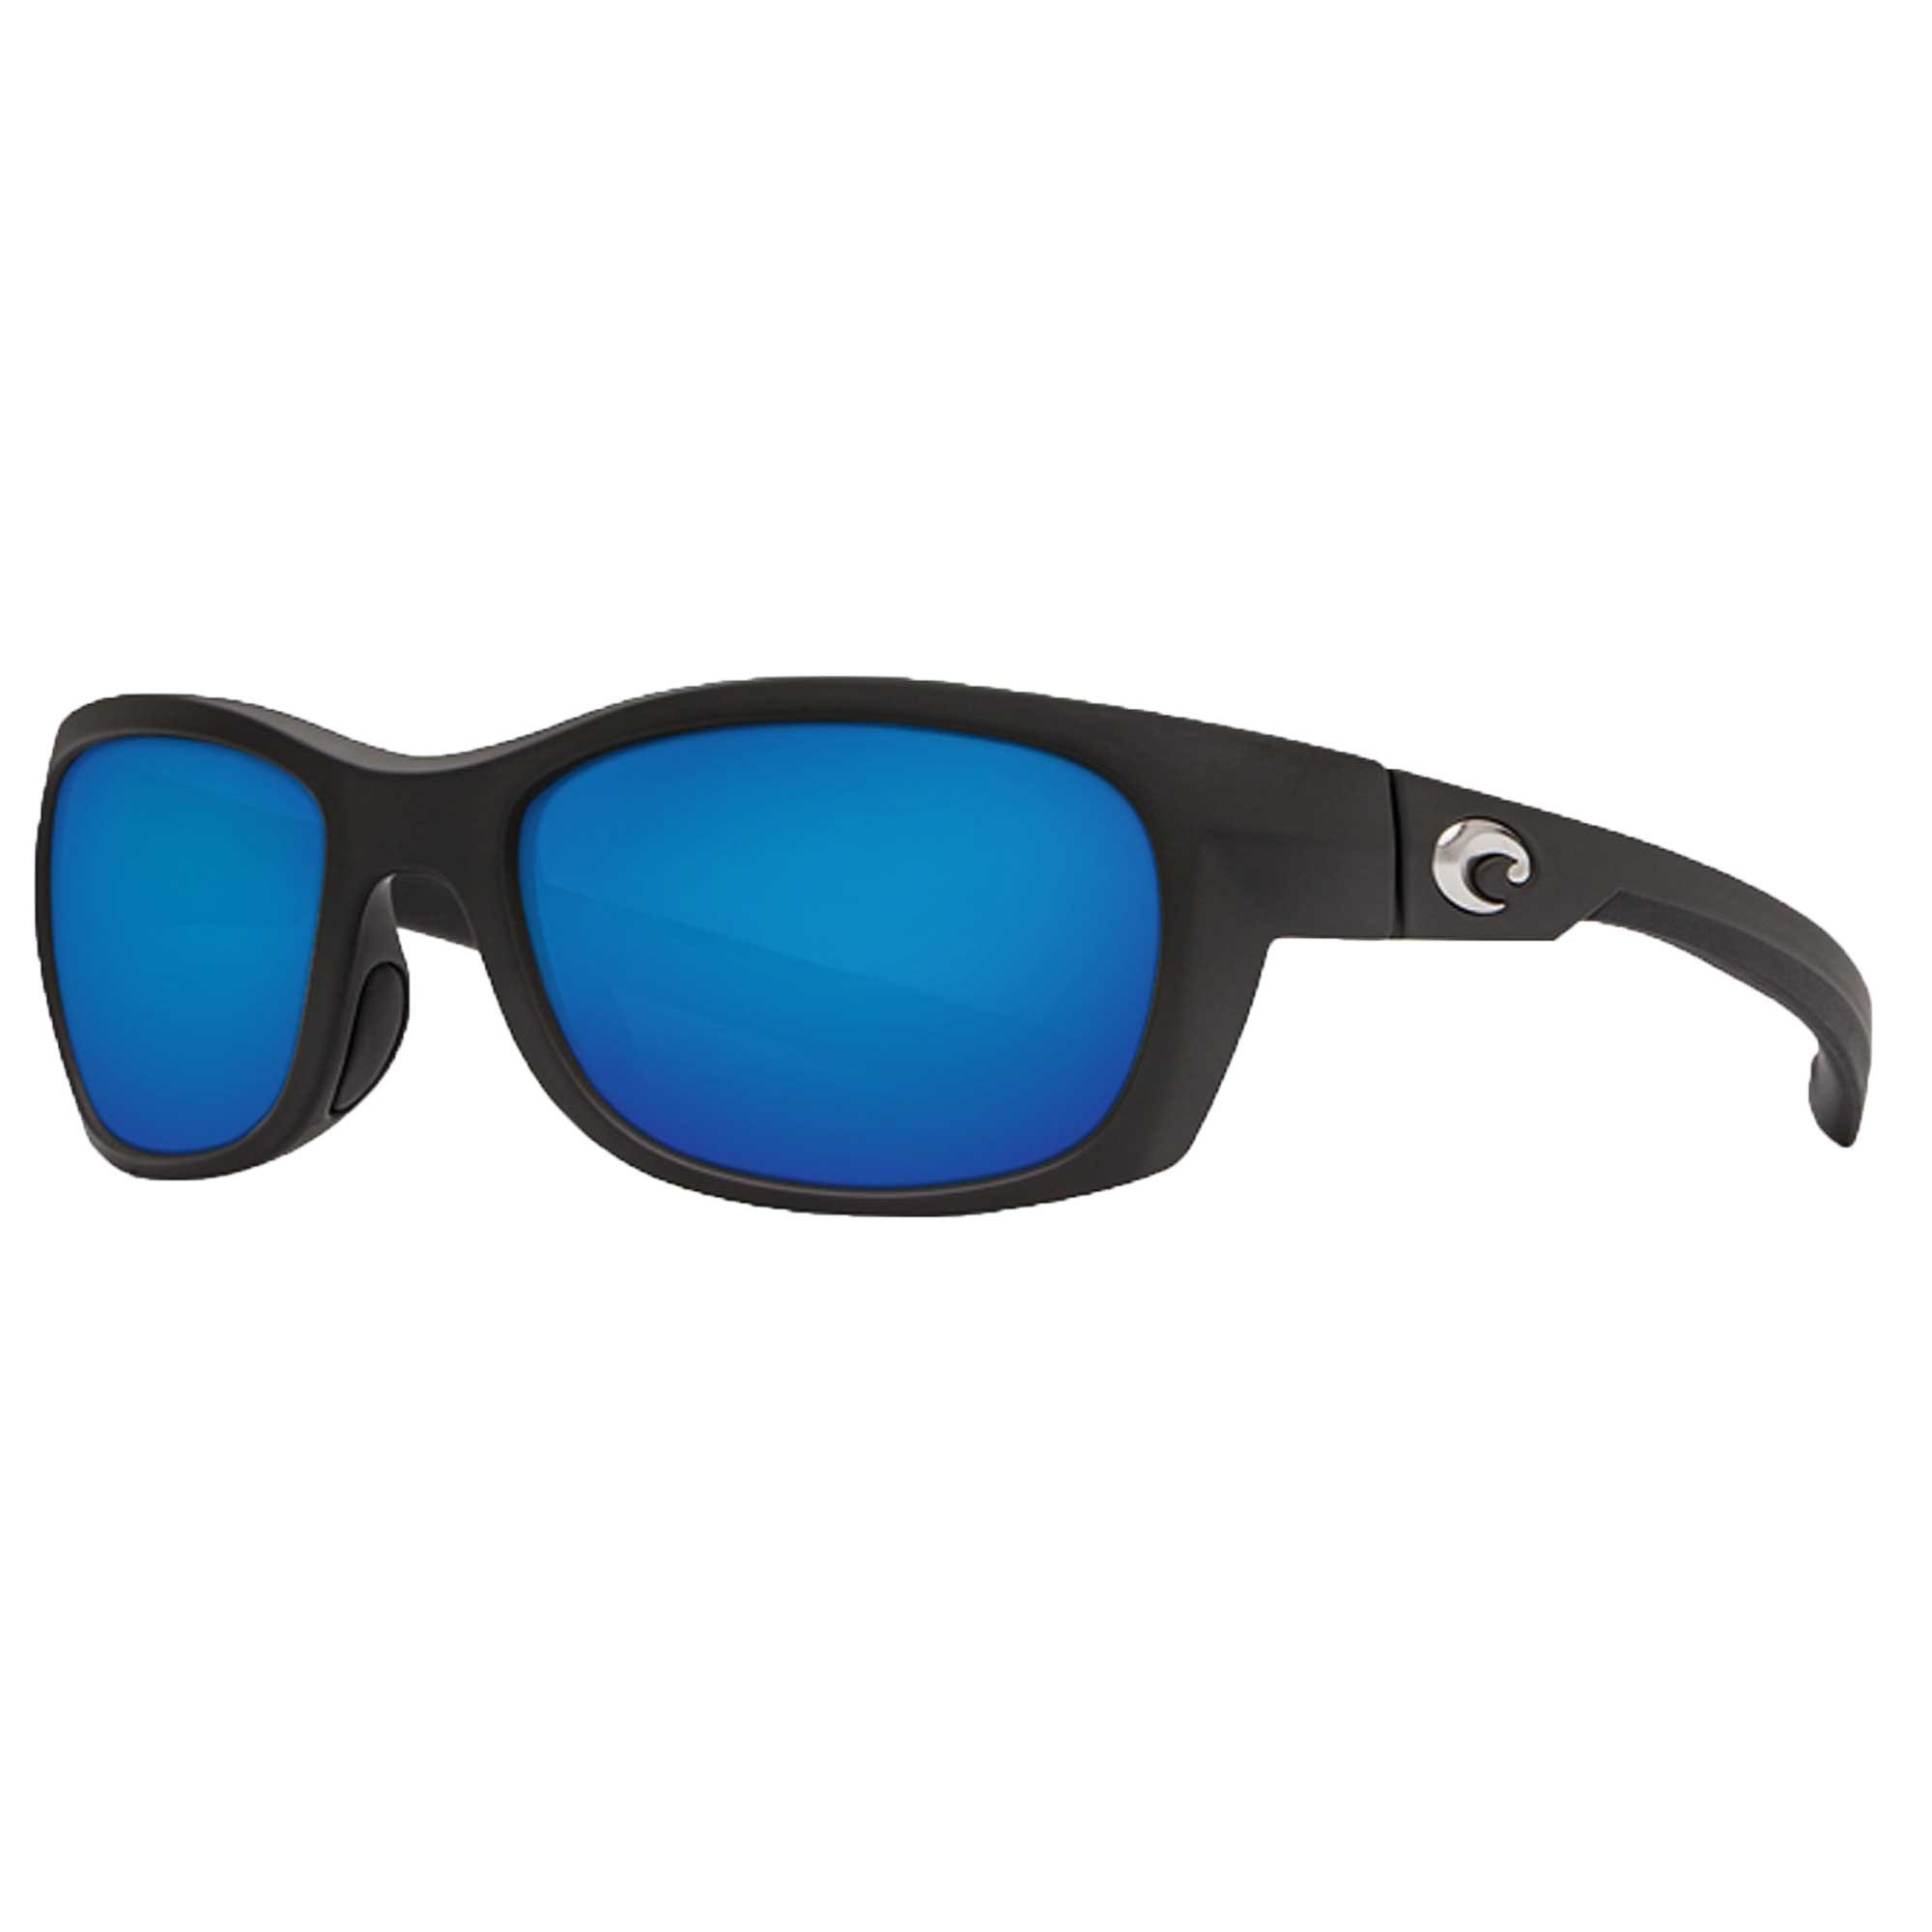 Costa Trevally Polarized Sunglasses - Costa 580 Glass Lens Blue Mirror Glass W580-Matte Black Frame, One Size